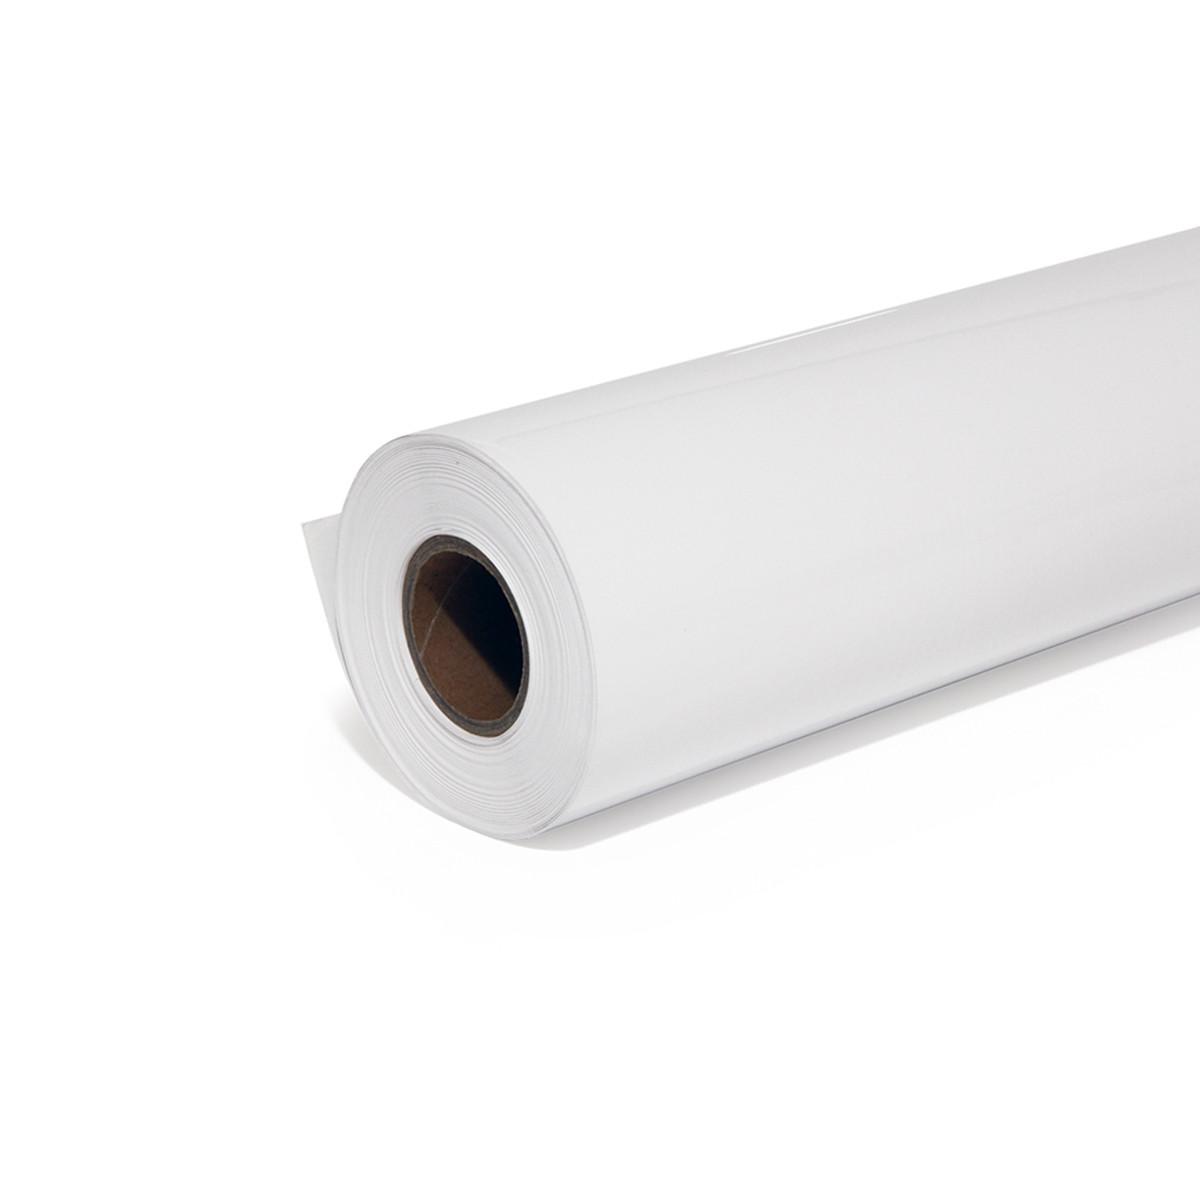 Papel para Plotter Sulfite   75g Rolo 1070mm x 50M